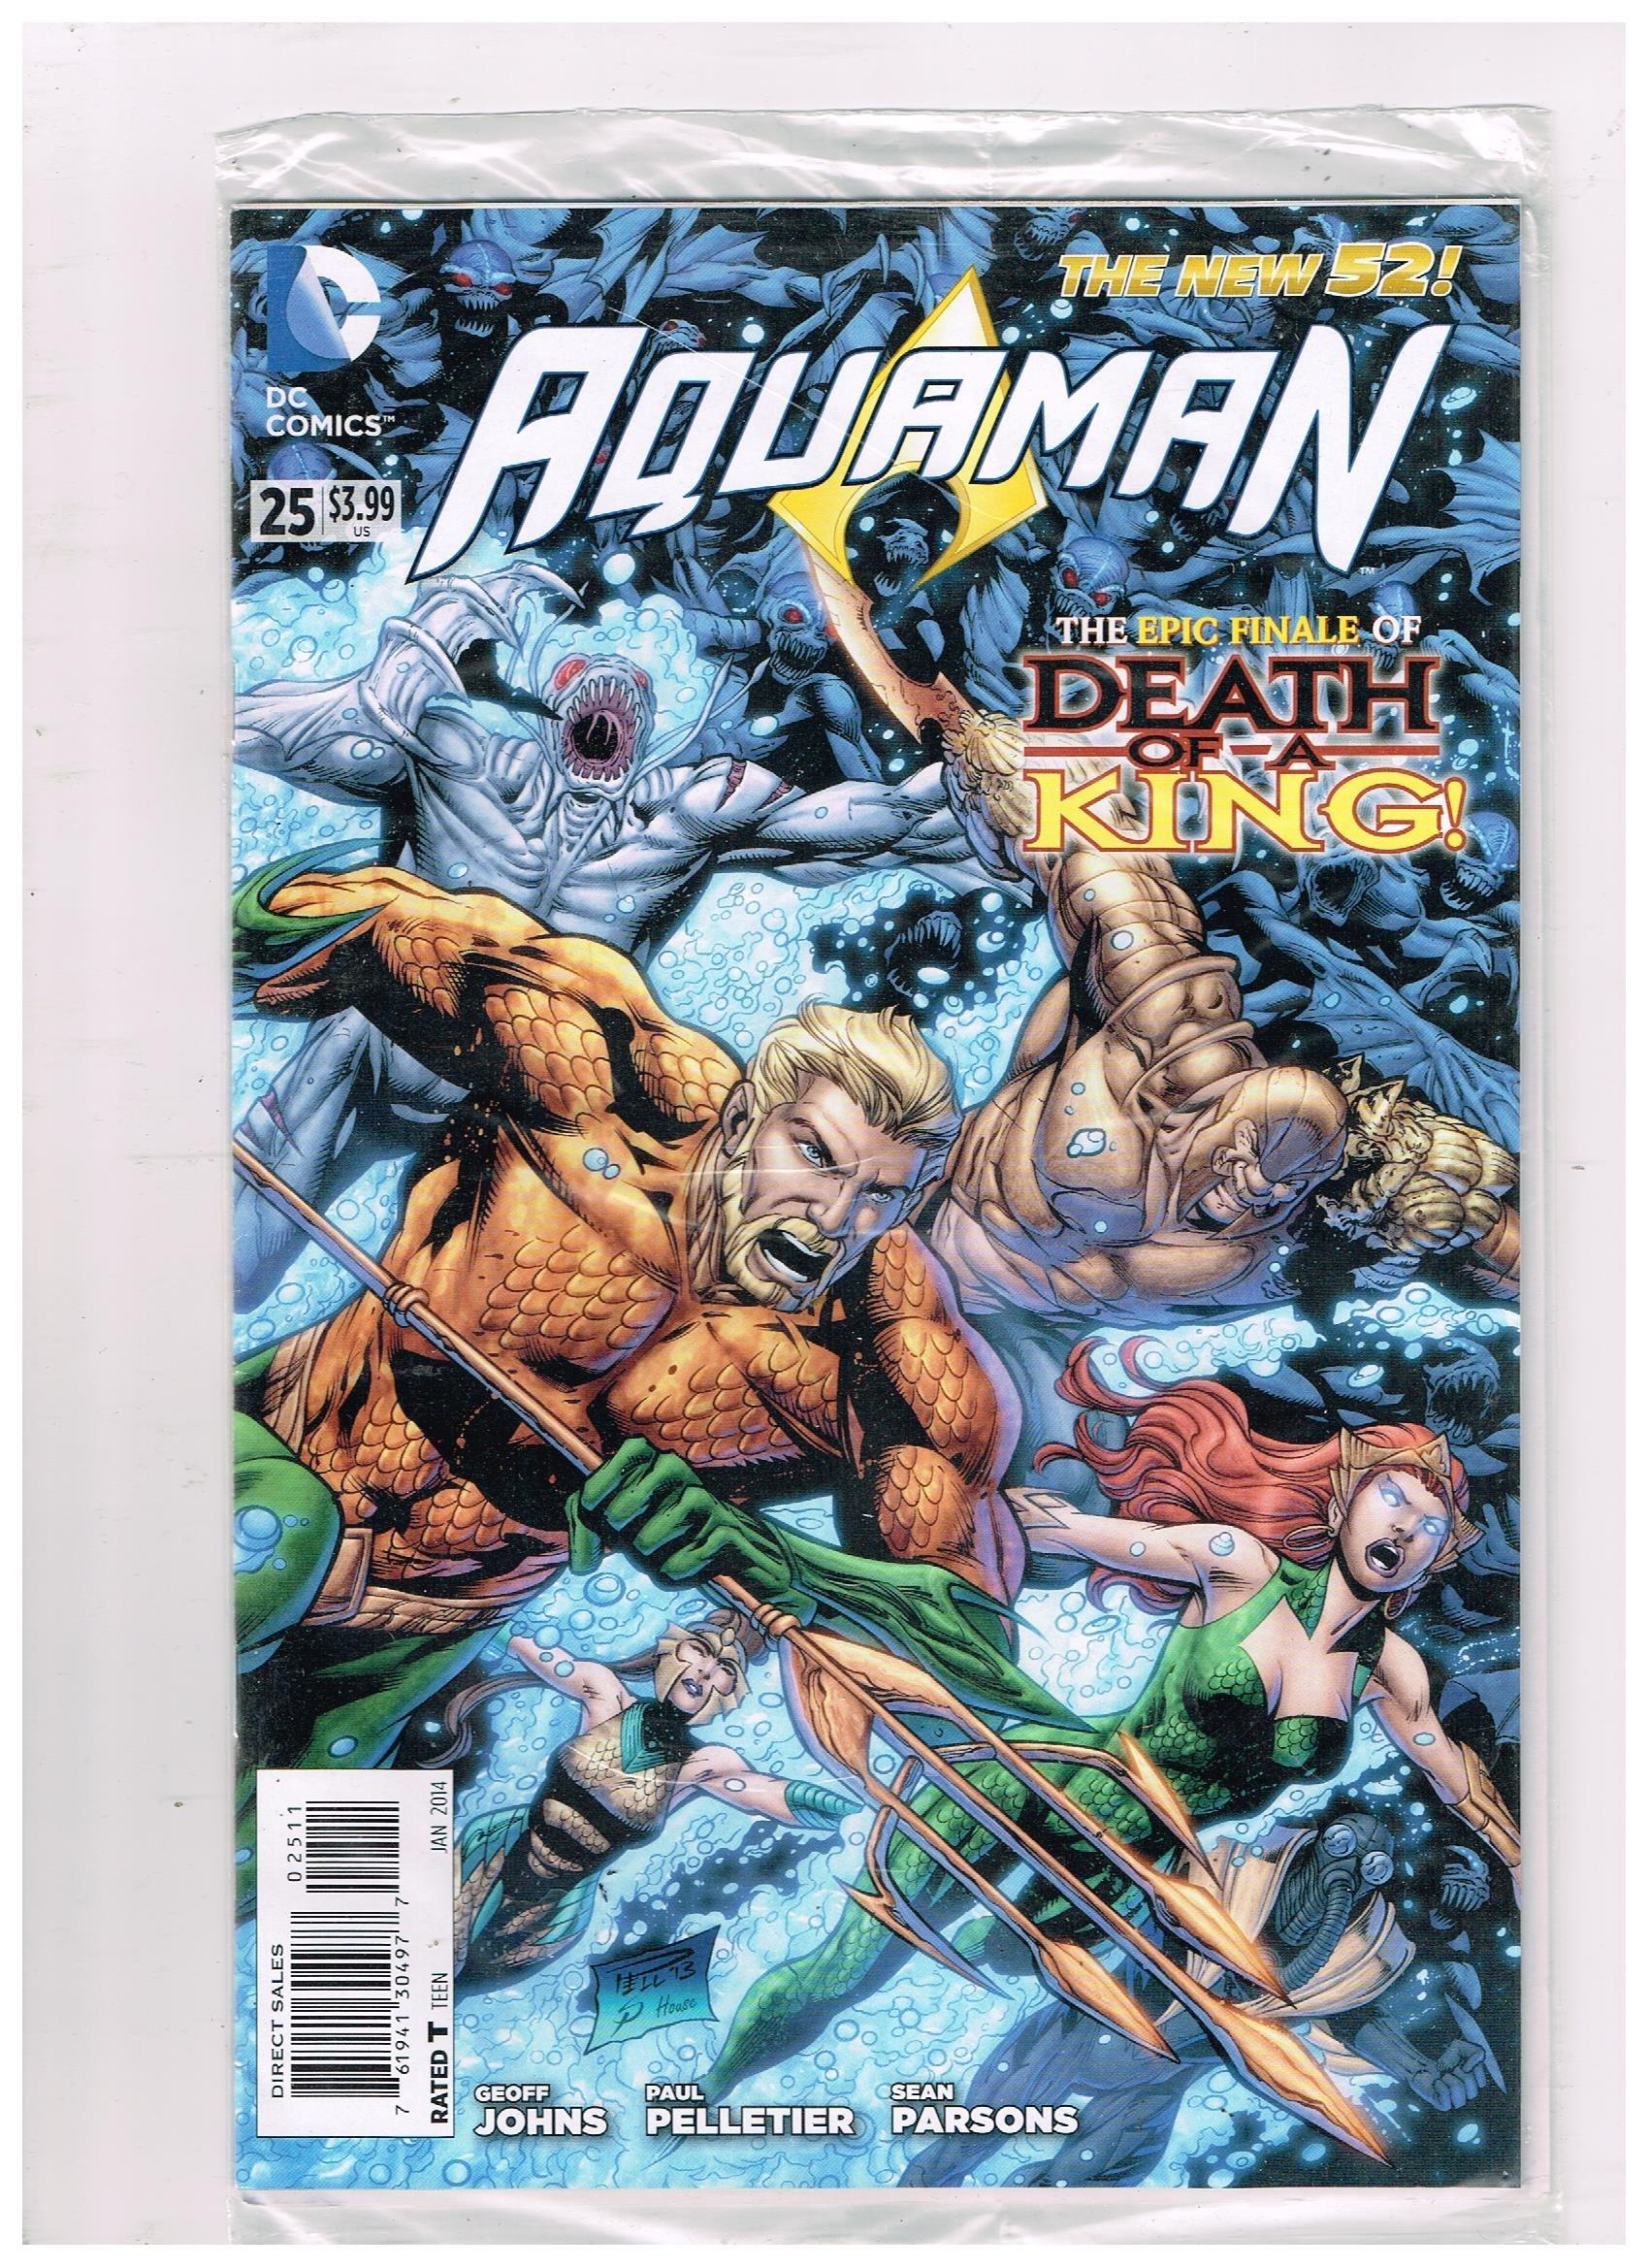 AQUAMAN # 25 DC Comic (Jan 2014) The New 52 PDF